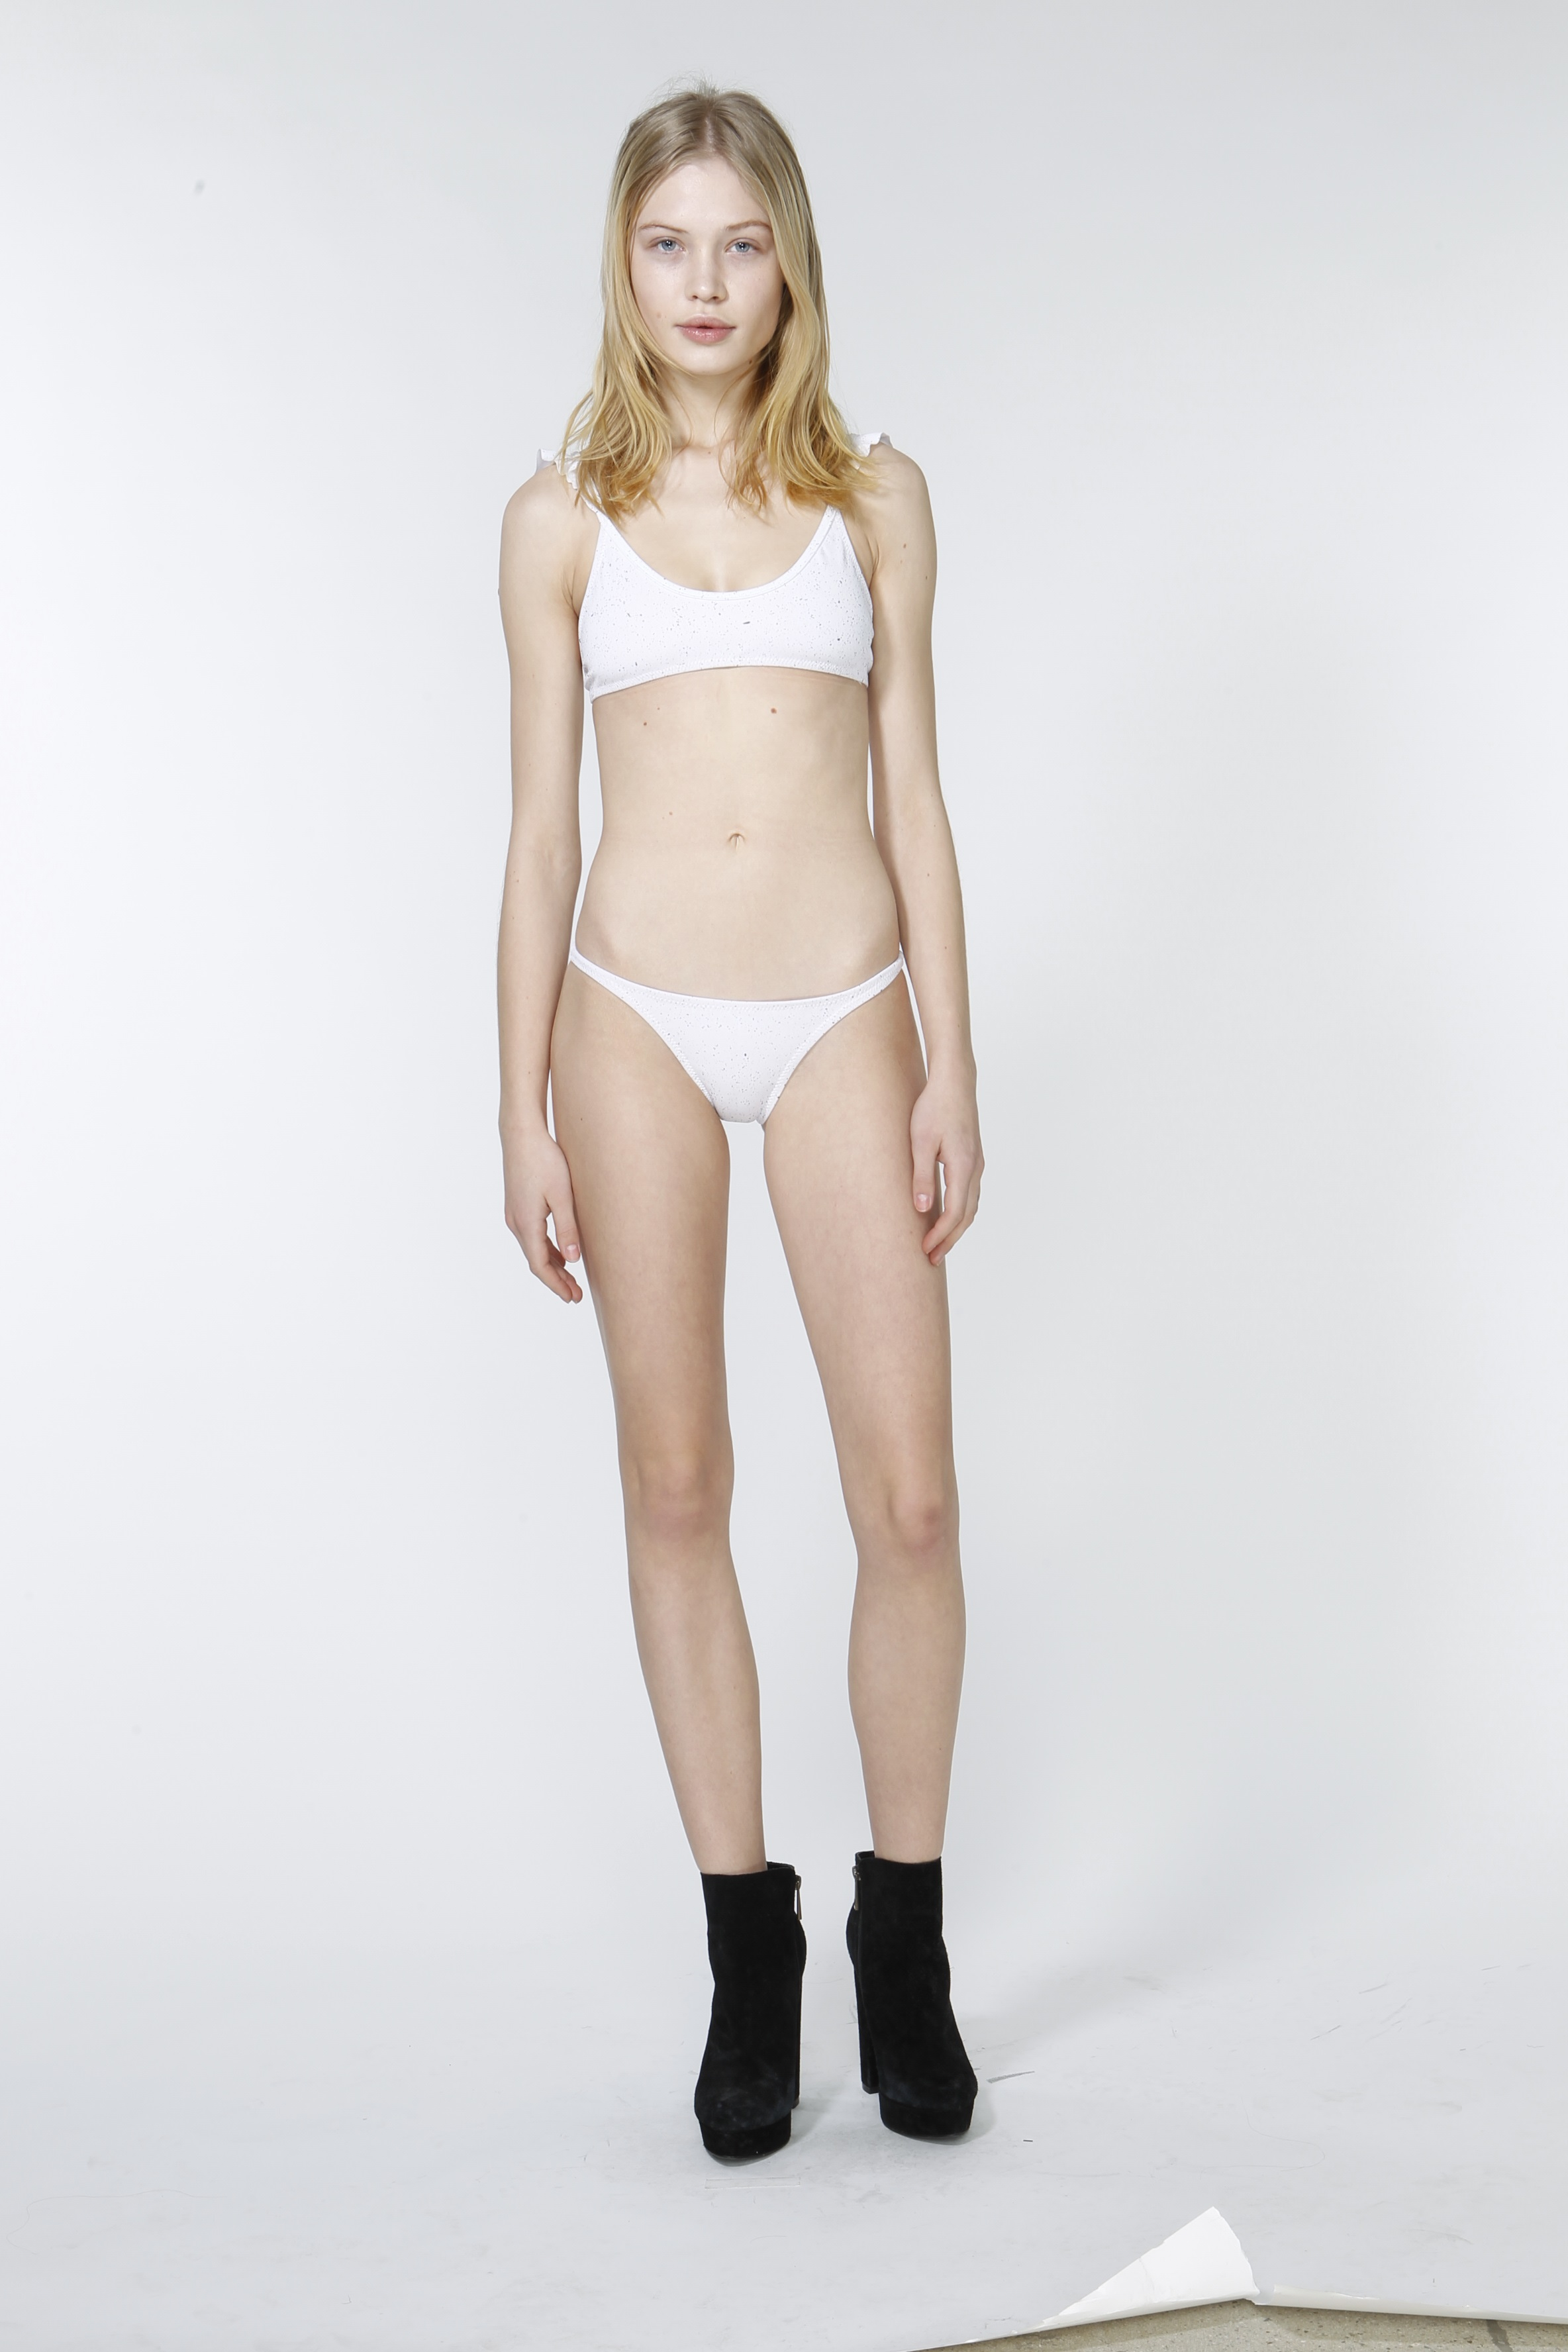 Camilla Forchhammer Christensen in lingerie